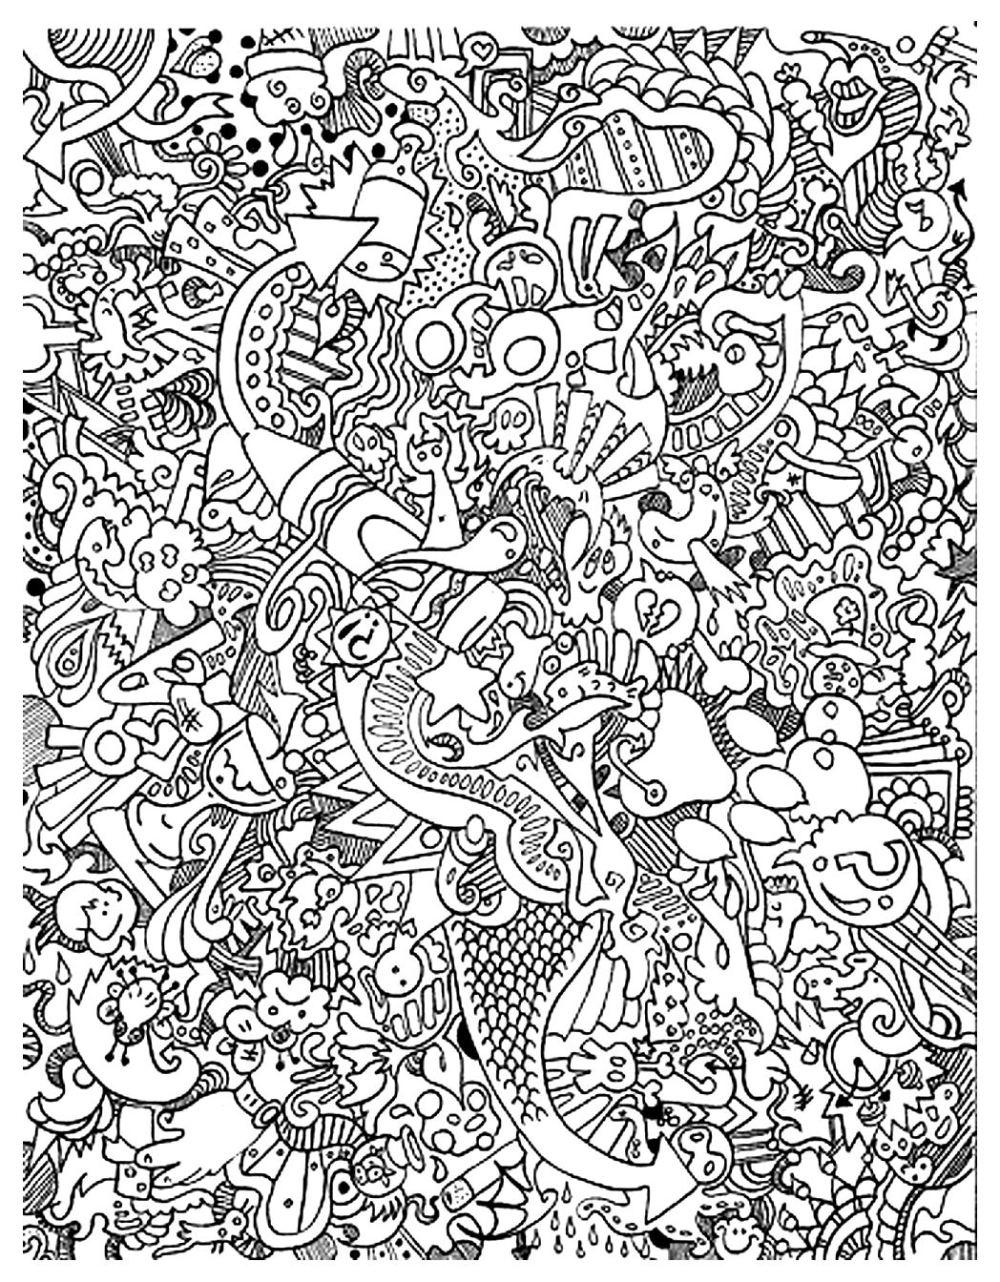 coloring-adult-big-mess